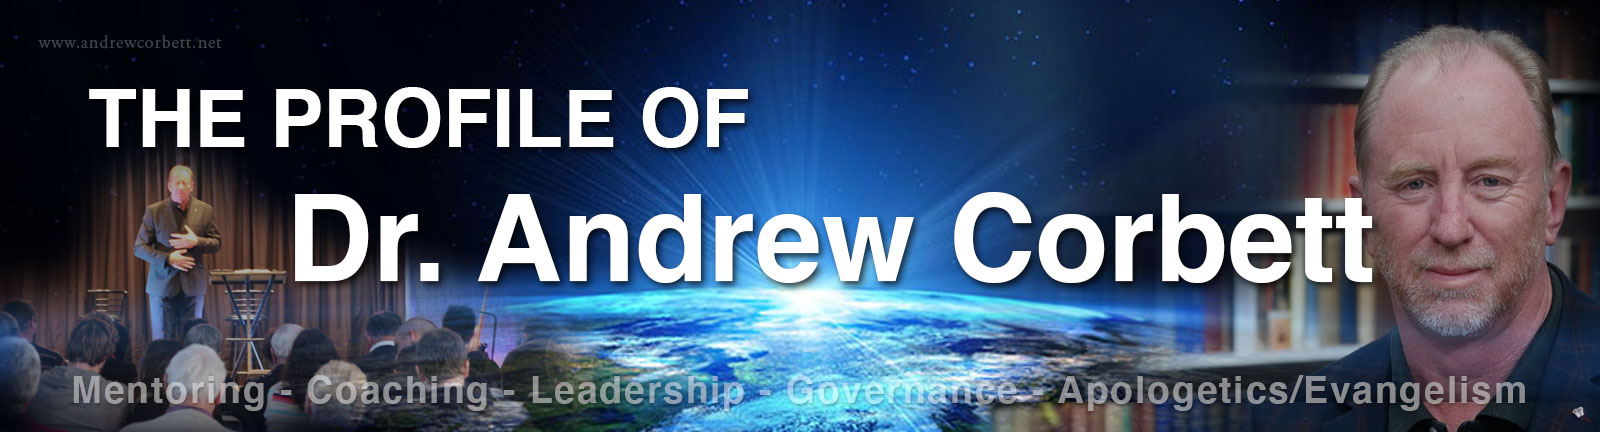 The Profile of Dr. Andrew Corbett